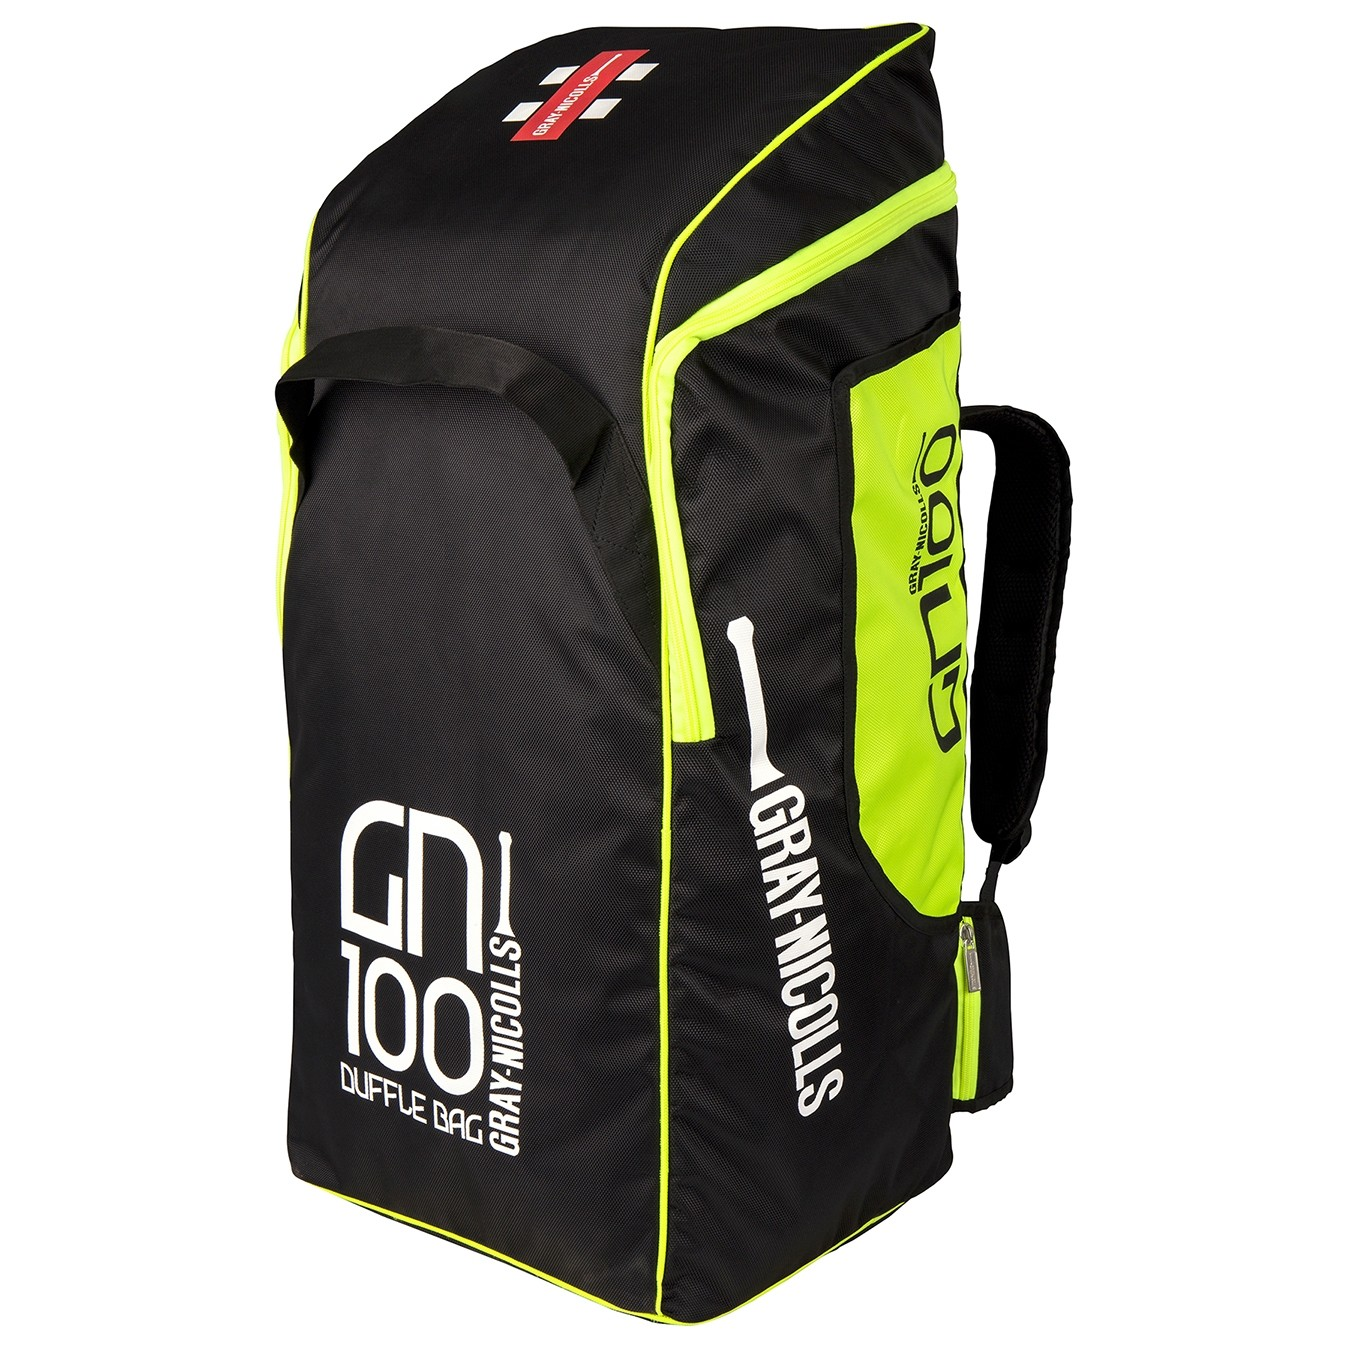 2021 Gray Nicolls GN 100 Duffle Cricket Bag - Black & Fluo Yellow